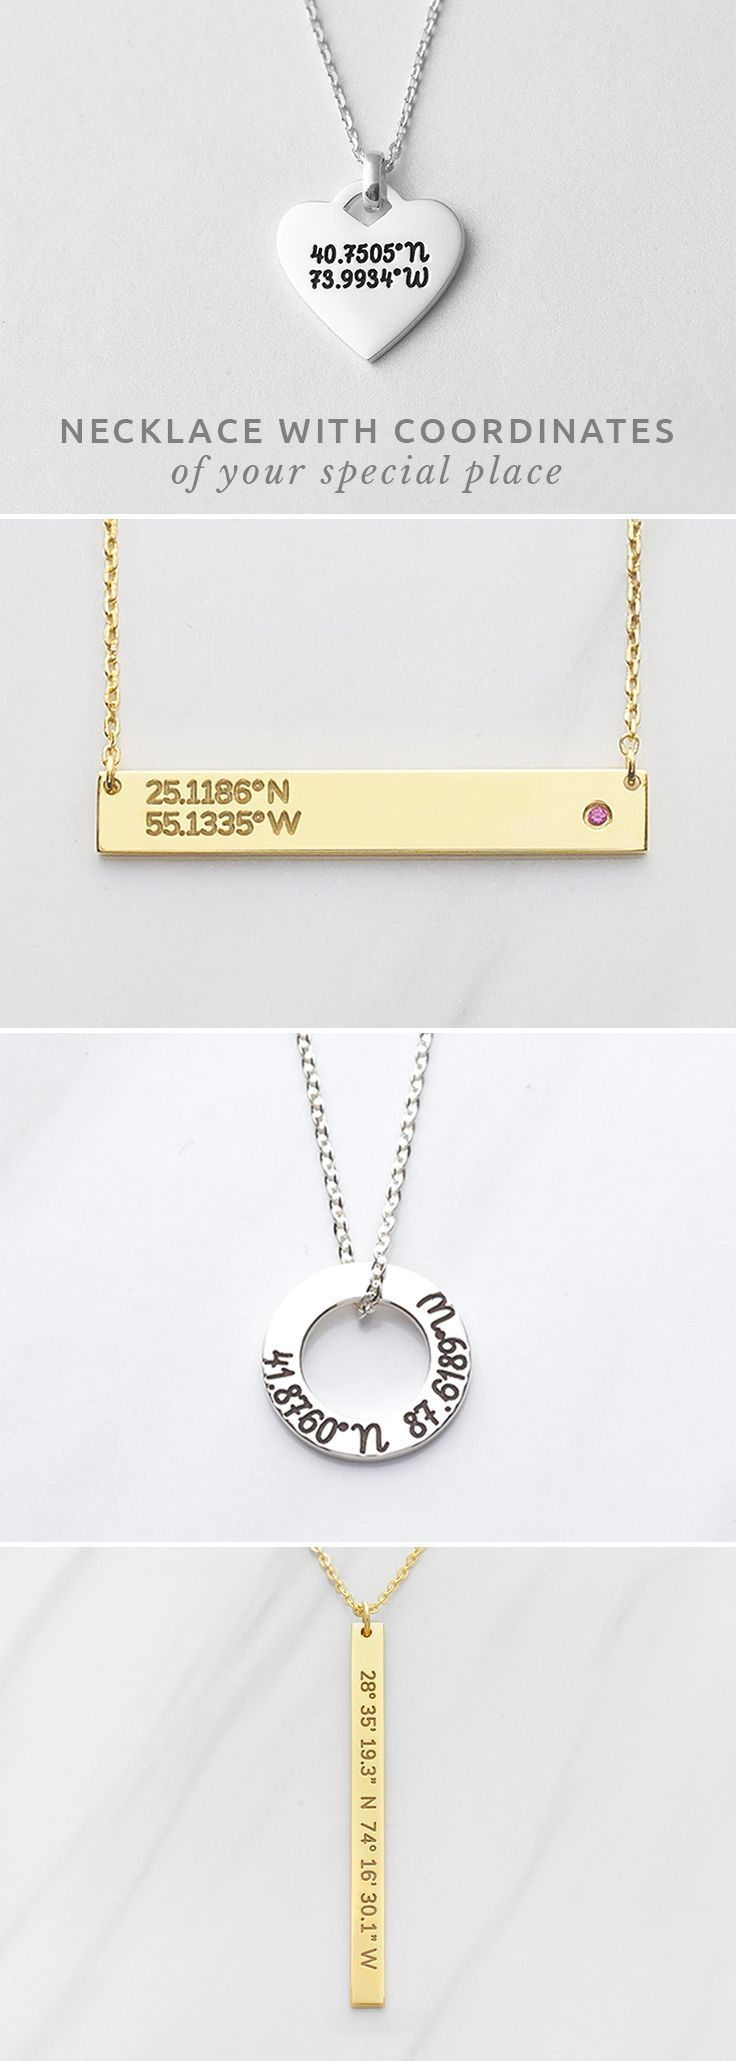 Custom Coordinates Coordinate Jewelry Graduation Necklace Personalized Graduation Gift Latitude Longitude Necklace Sterling Silver Gold